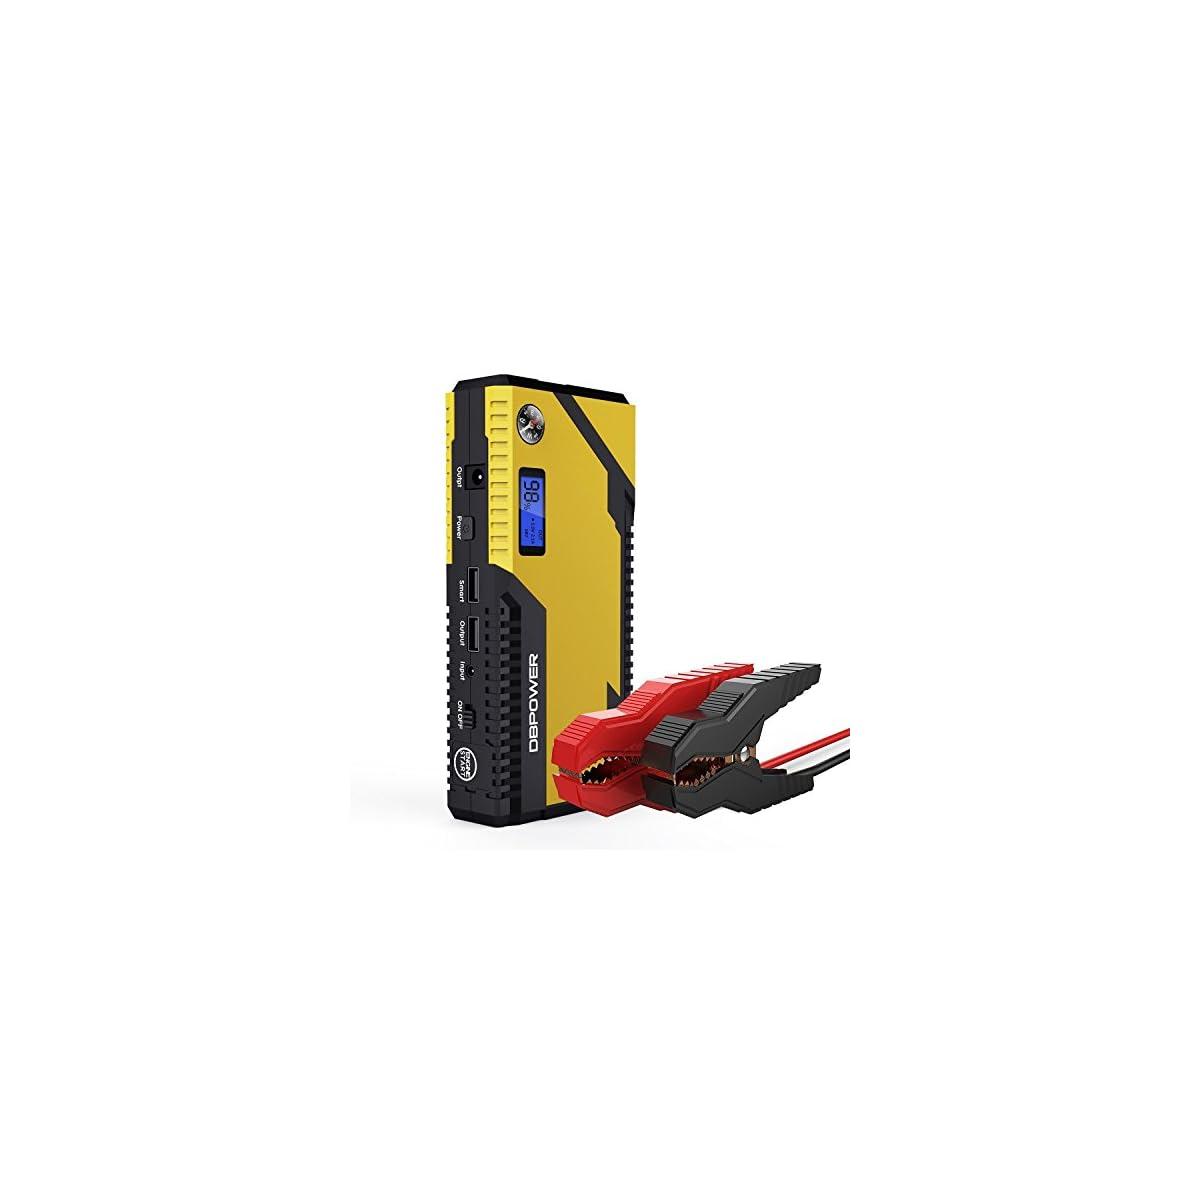 51FRCrm9IbL. SS1200  - Arrancador de batería portátil para coches DBPOWER® 500A 12000mAh, batería de emergencia, doble puerto USB, linterna LED y brújula.